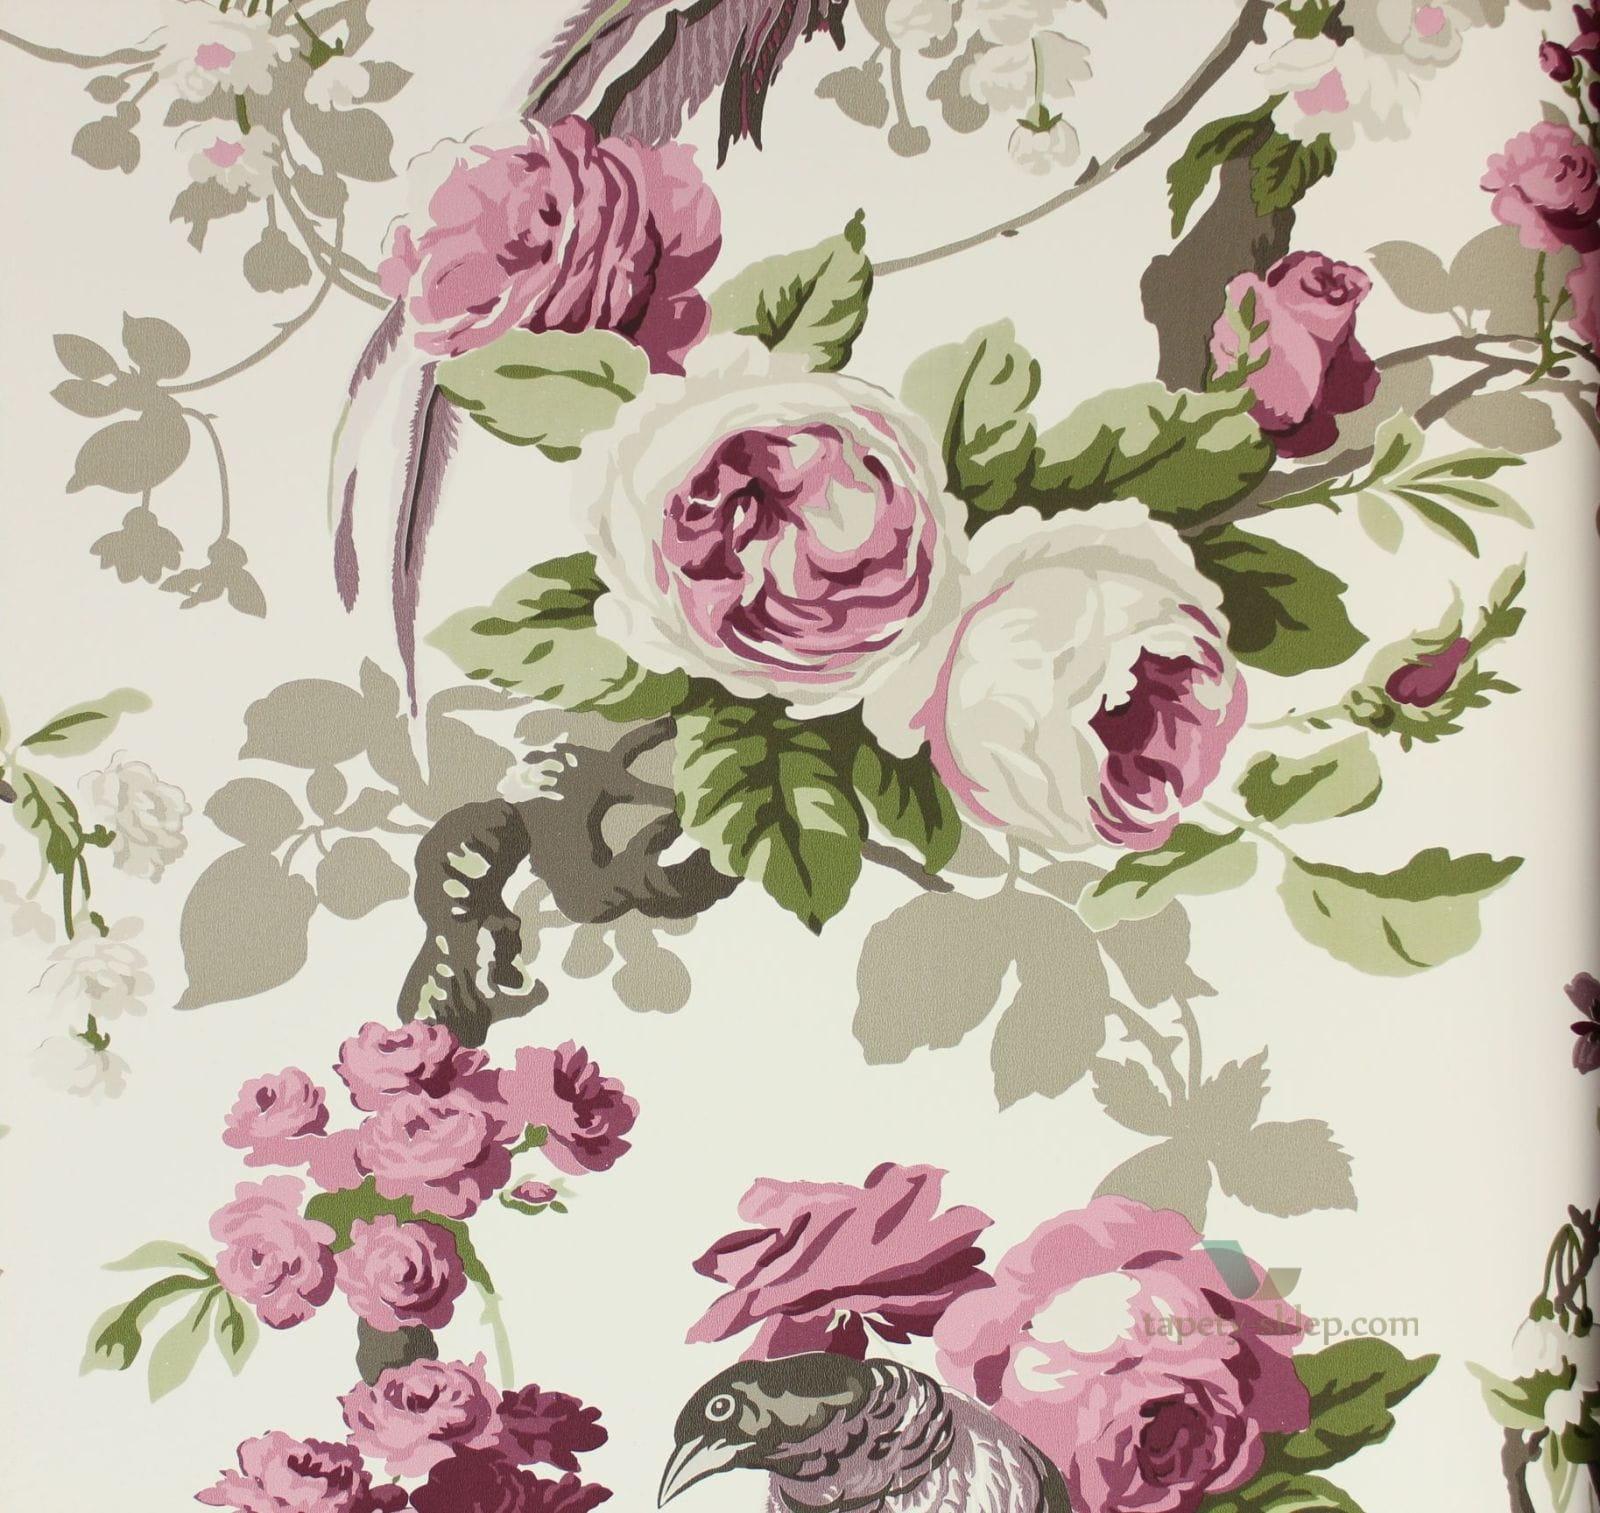 Tapeta w kwiaty Igone Bloomingdale 326152  Bloomingdale